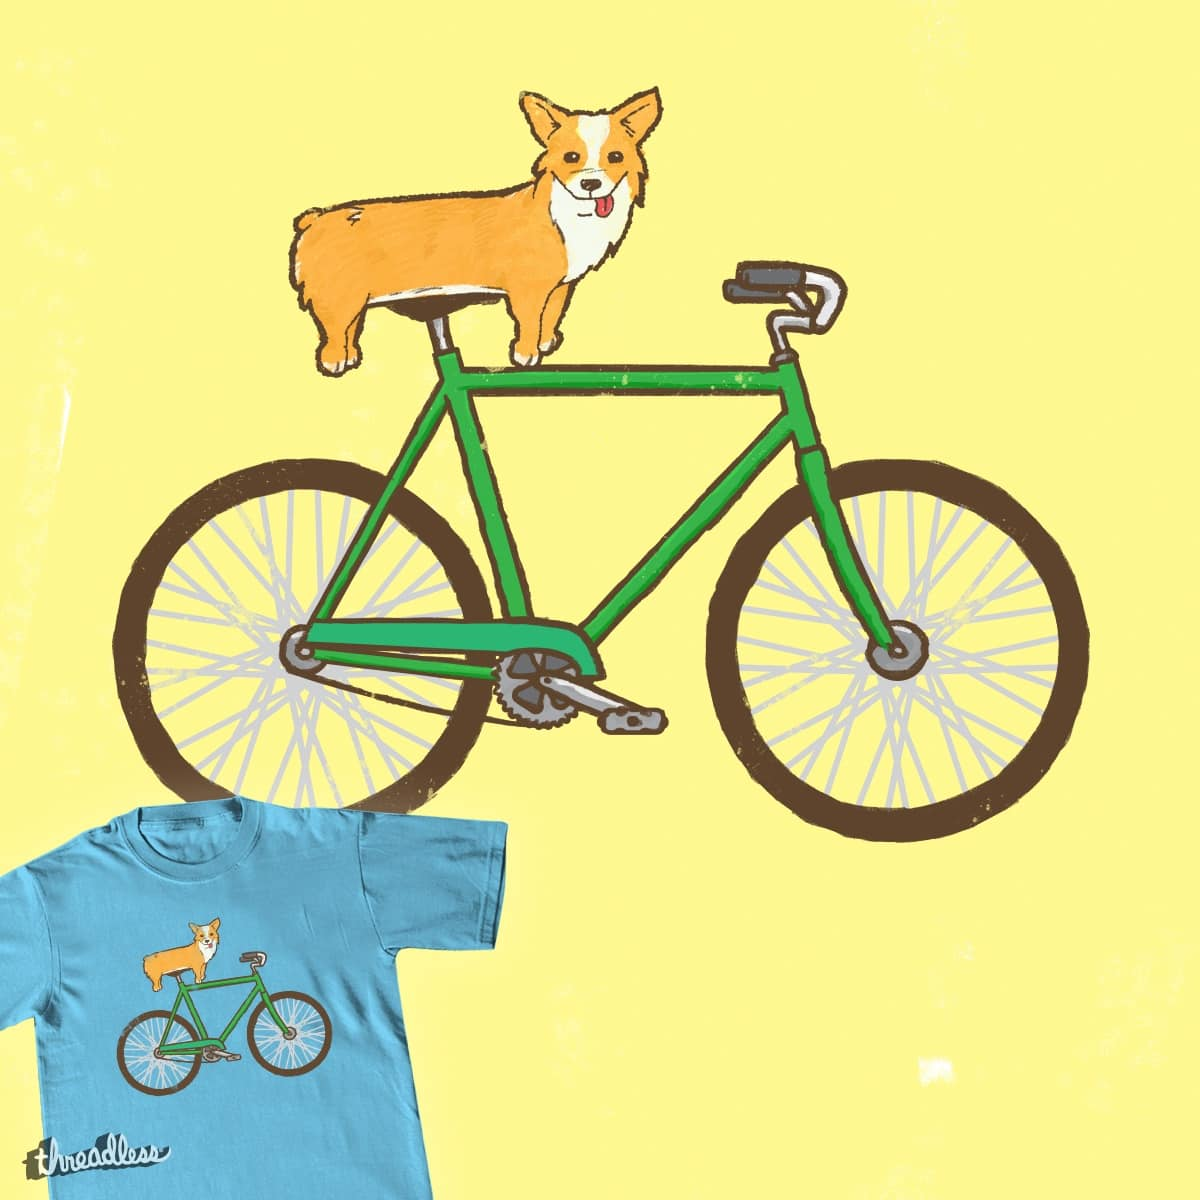 Corgi on a bike by speedyjvw on Threadless